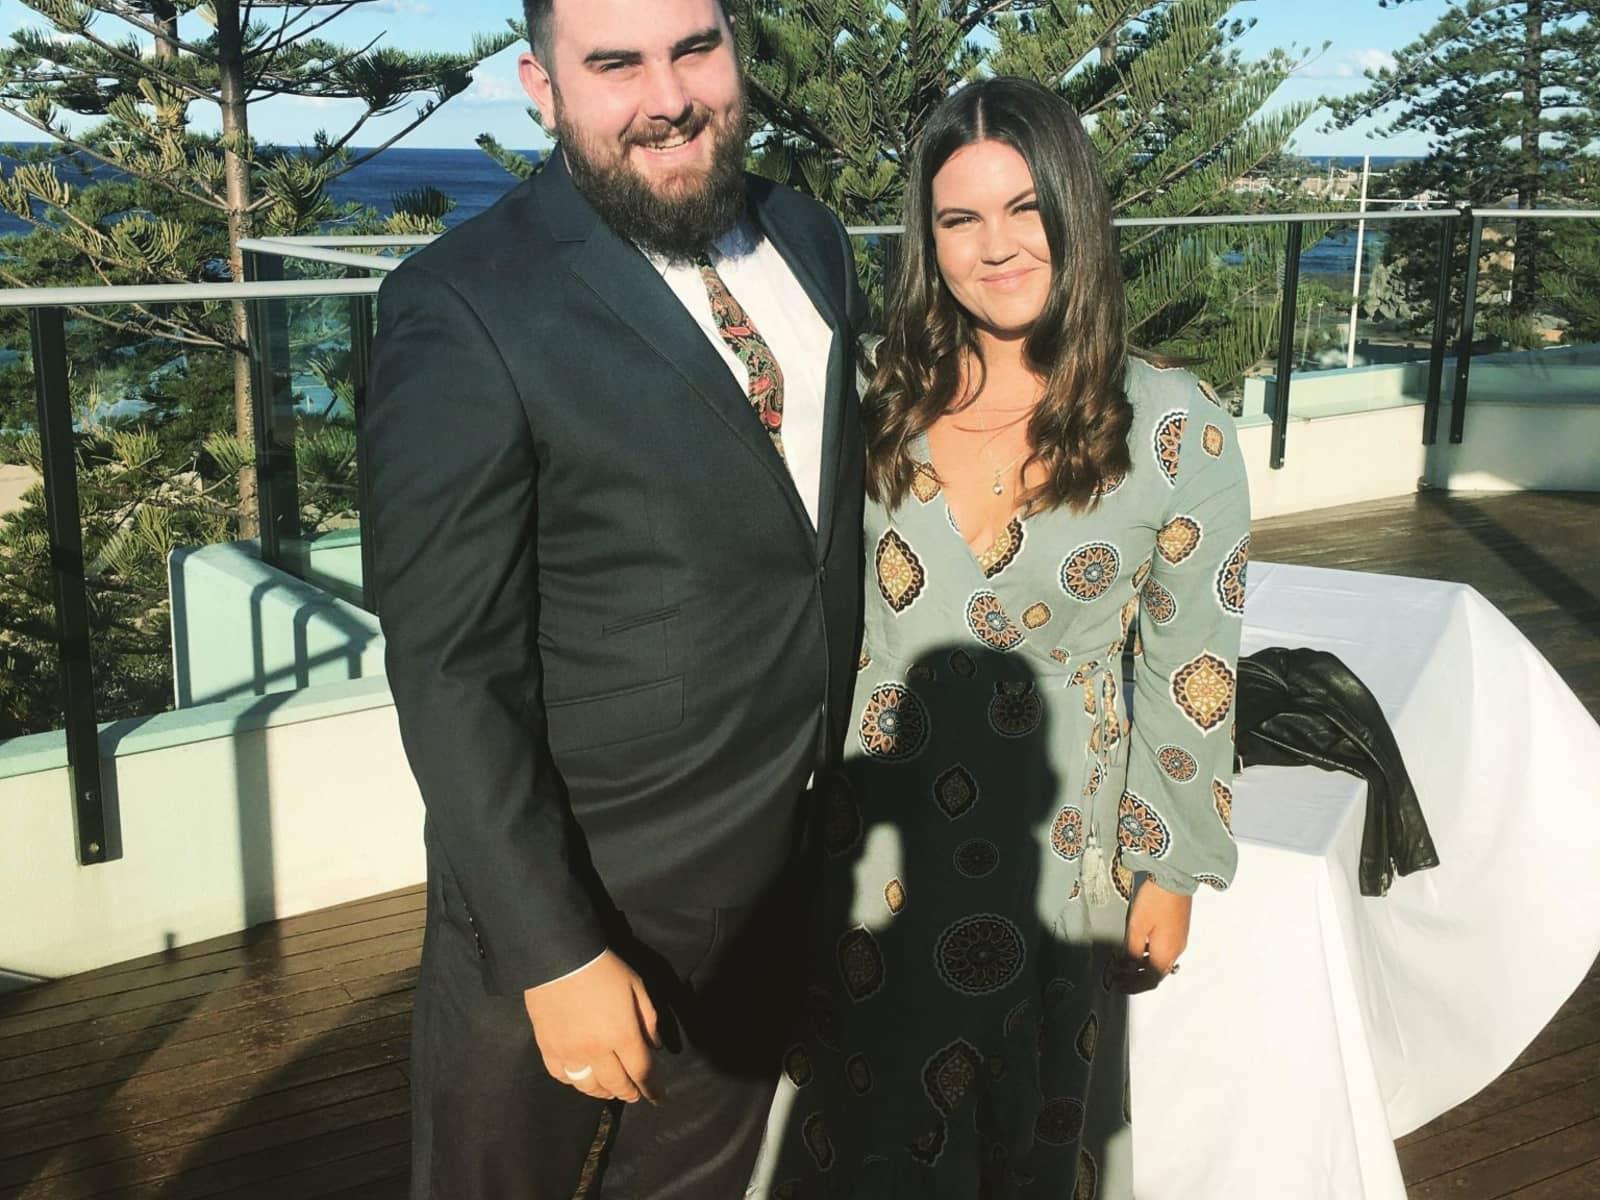 Tenaya & Nicholas from Sydney, New South Wales, Australia